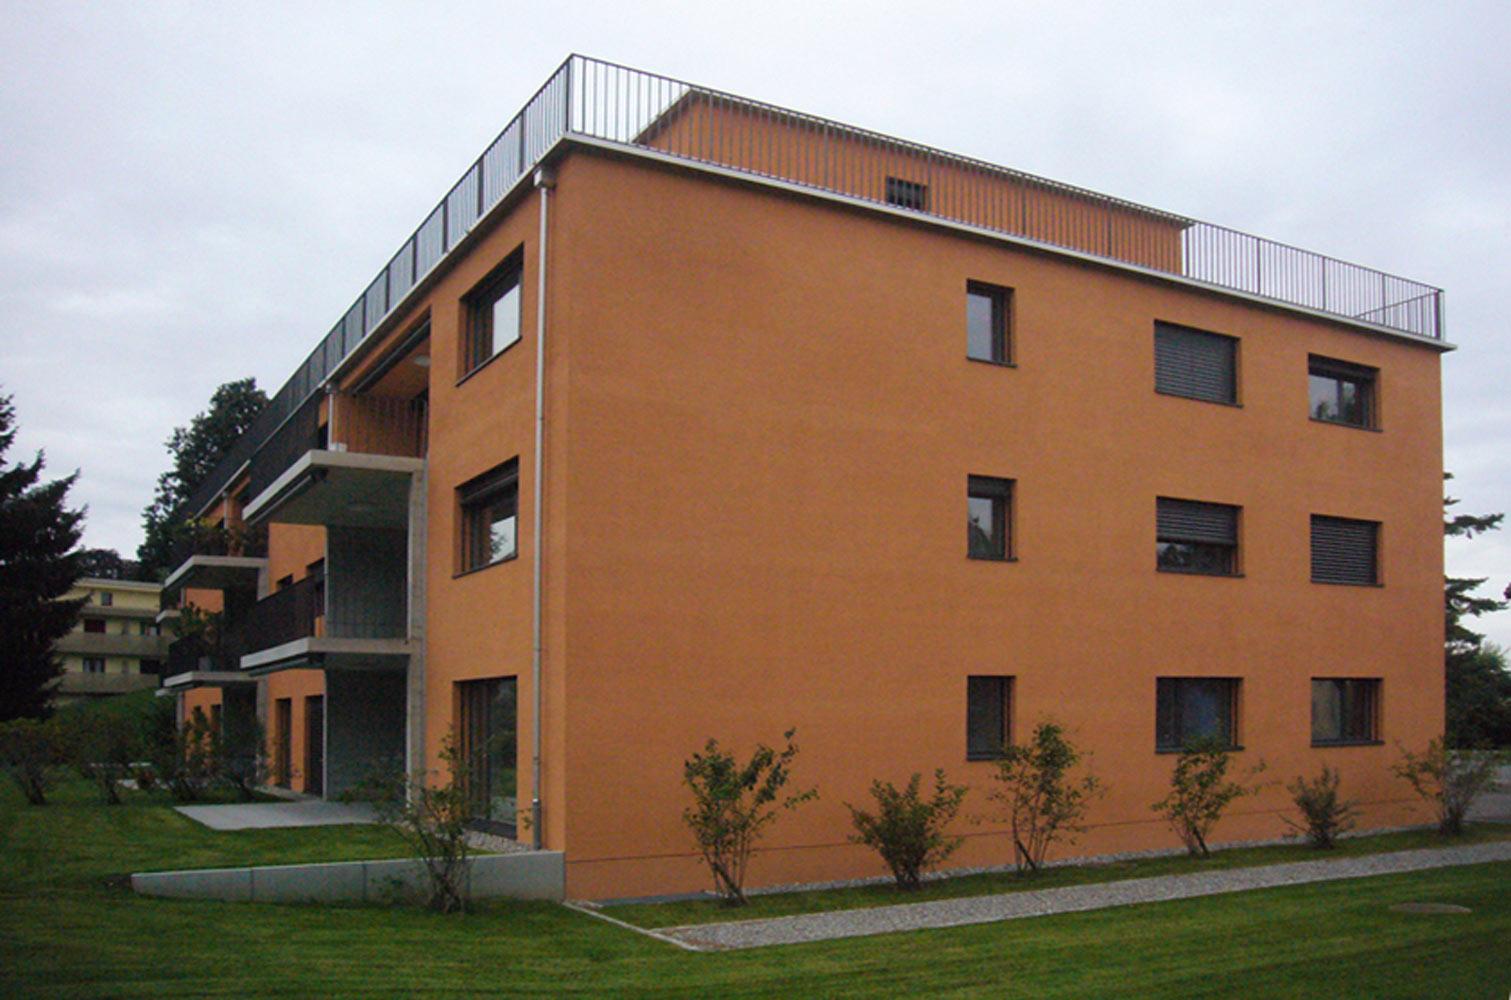 Neubau-mehrfamilienhaus-rorschach-stahl-holz-fassade.jpg